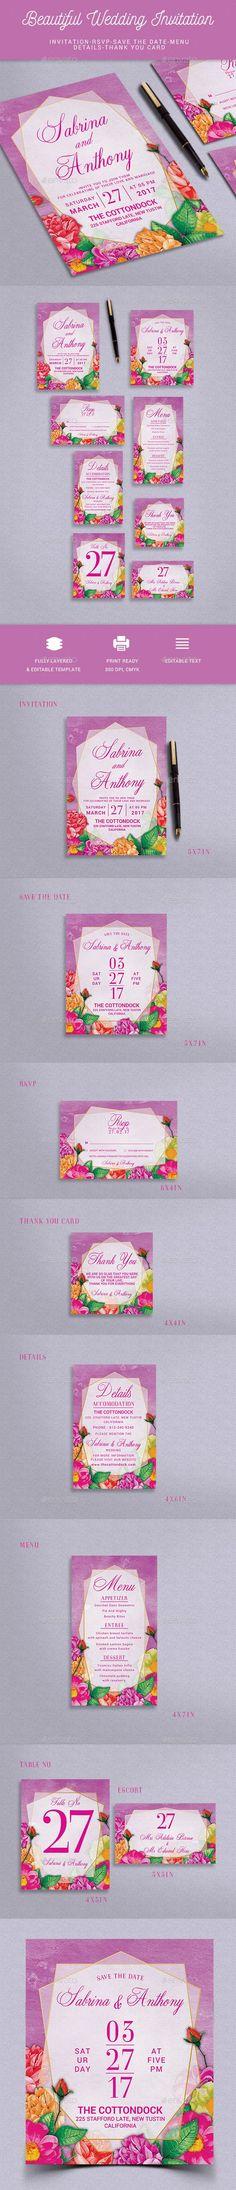 wedding invitation design psd%0A Wedding Invitation